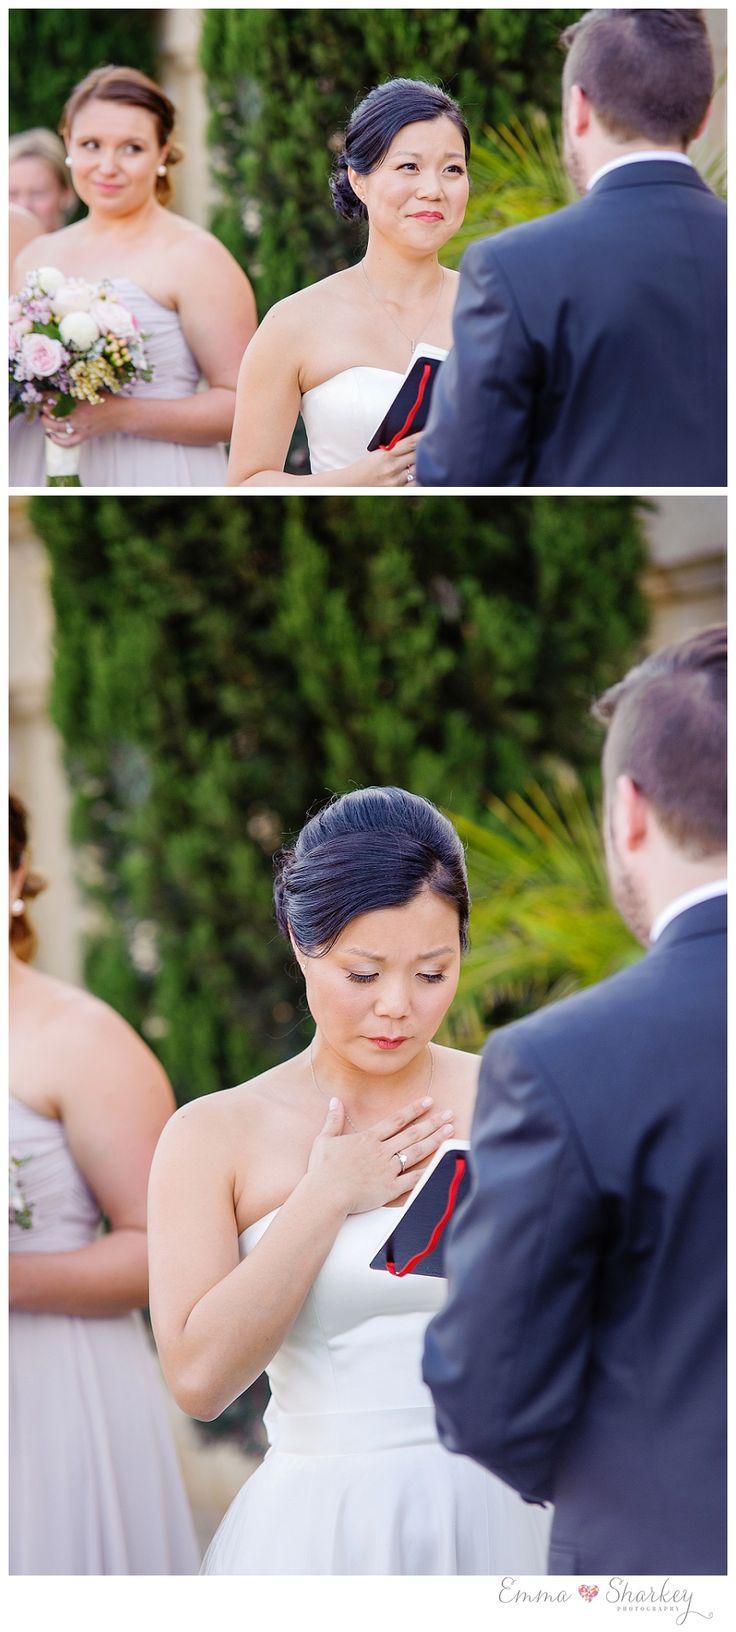 Emma-Sharkey-Wedding-Photography-Kingsbrook-Estate0047